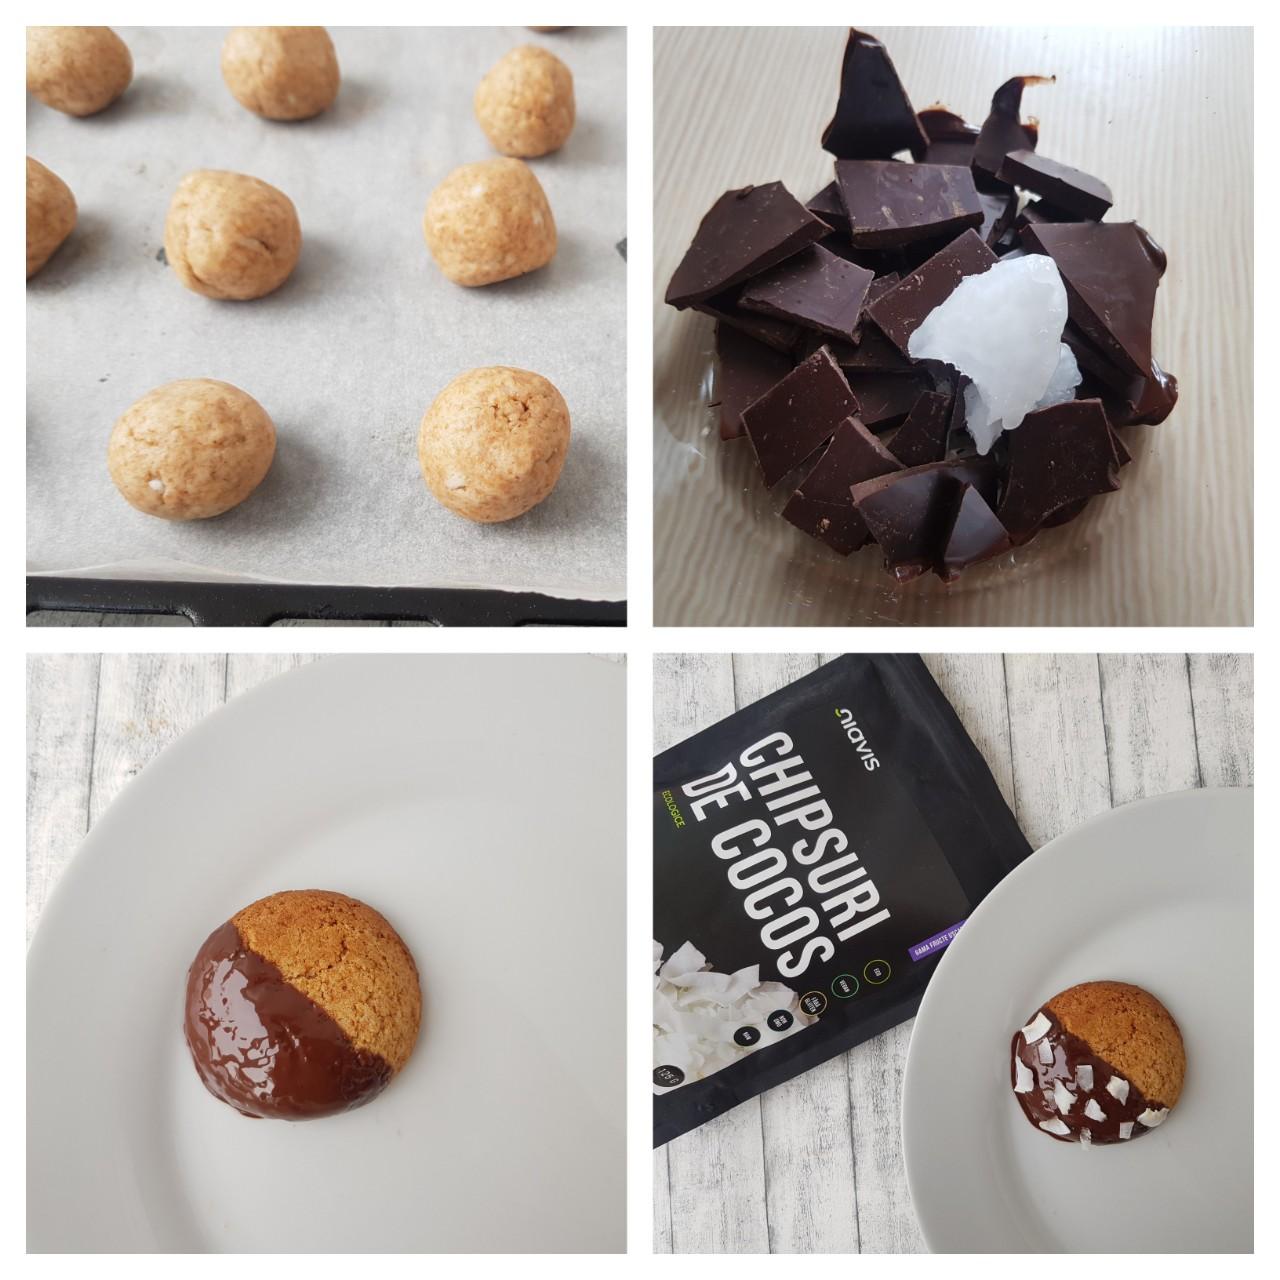 Biscuiti vegani cu ciocolata și cocos niavis - foodieopedia.ro (1)